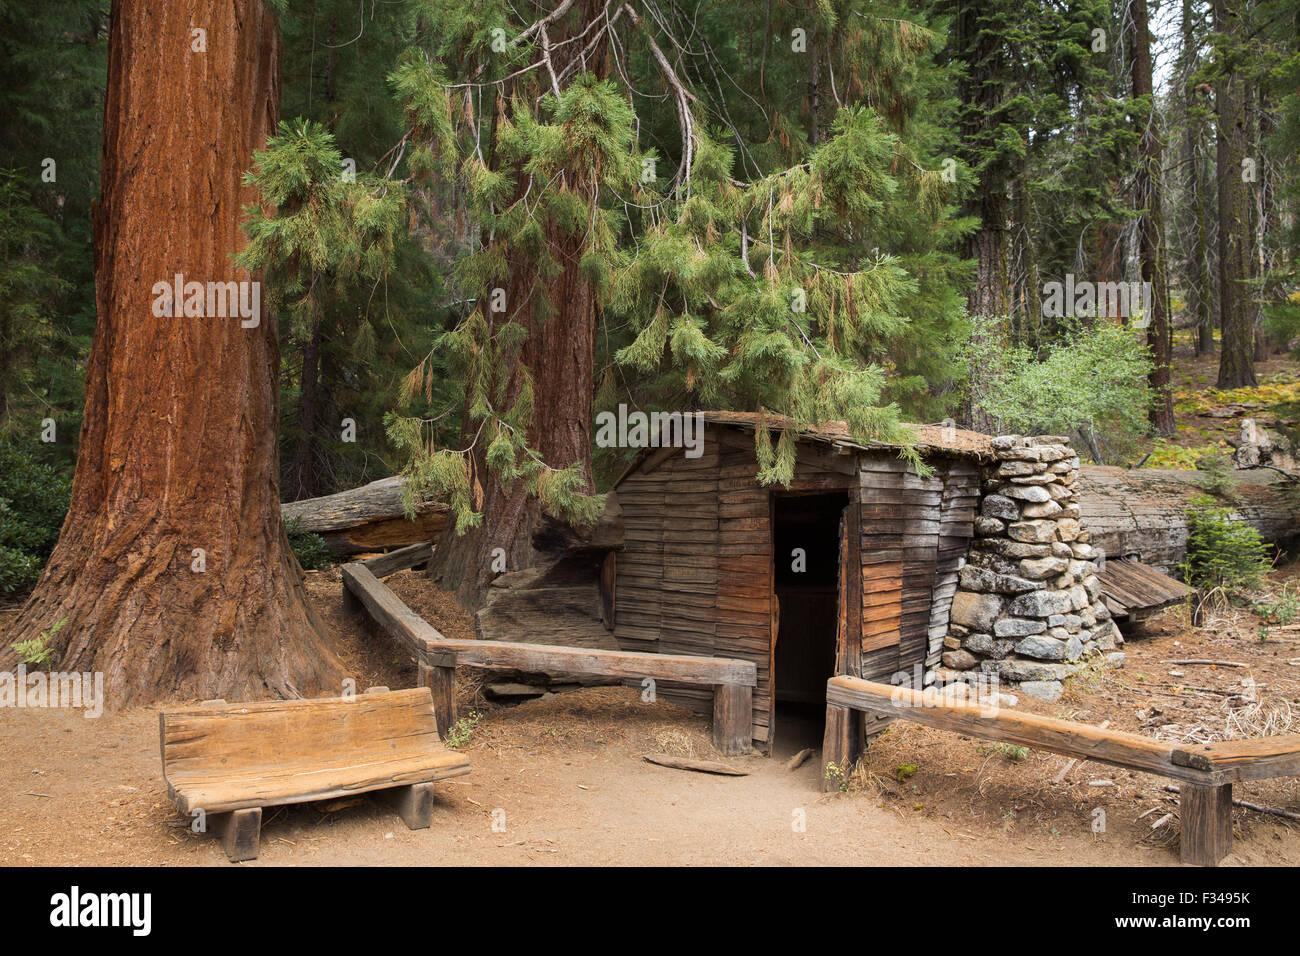 Tharp's Log, Log Meadow, Sequoia National Park, California, USA - Stock Image